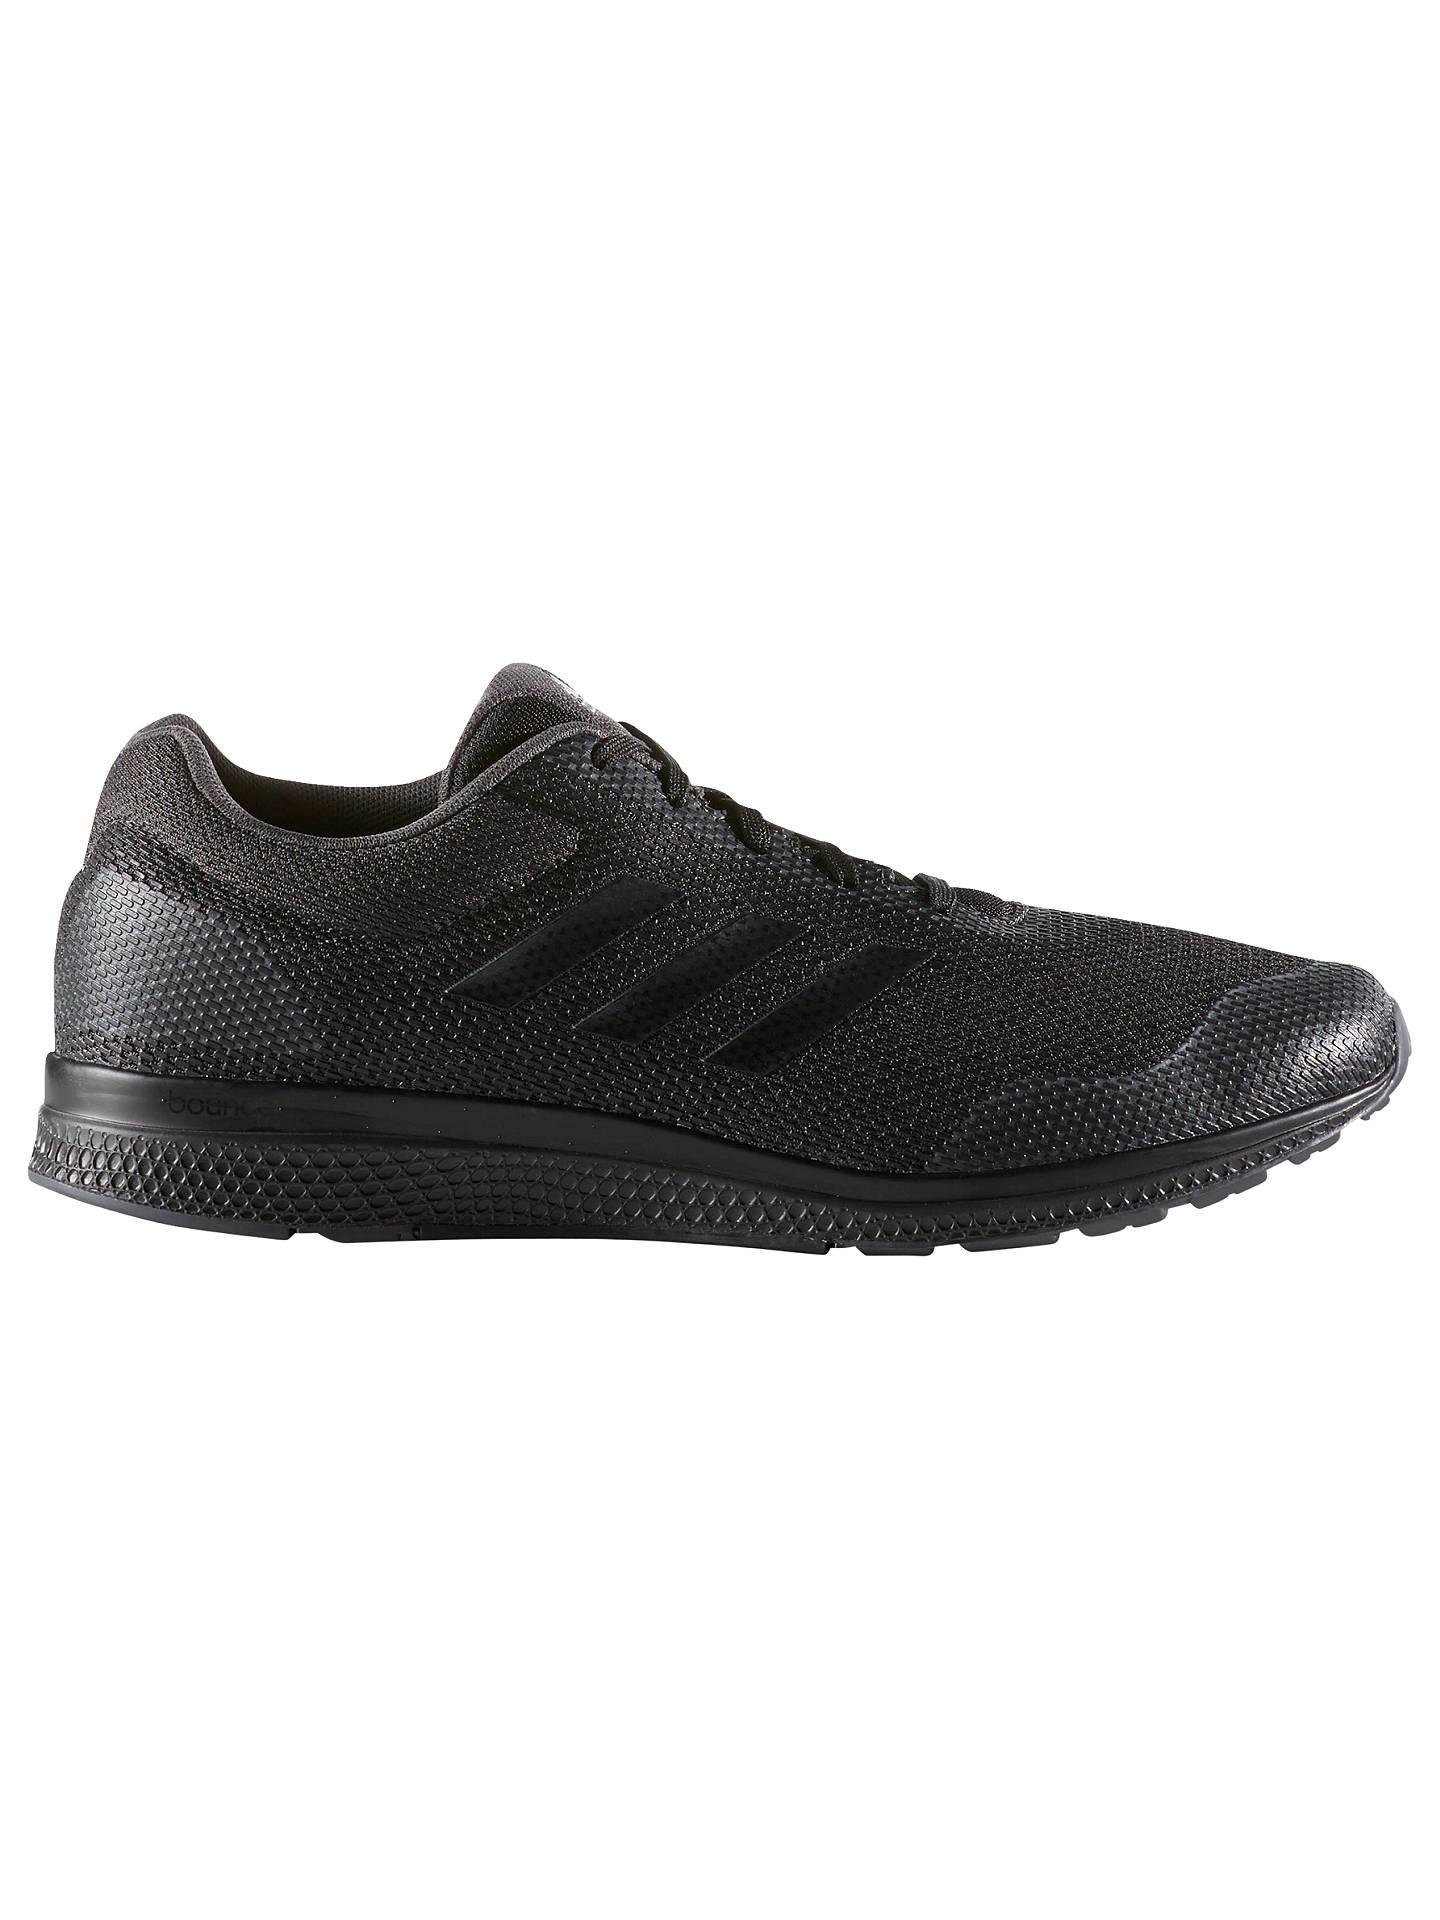 d9415617e Buy adidas Mana Bounce 2.0 Men s Running Shoes